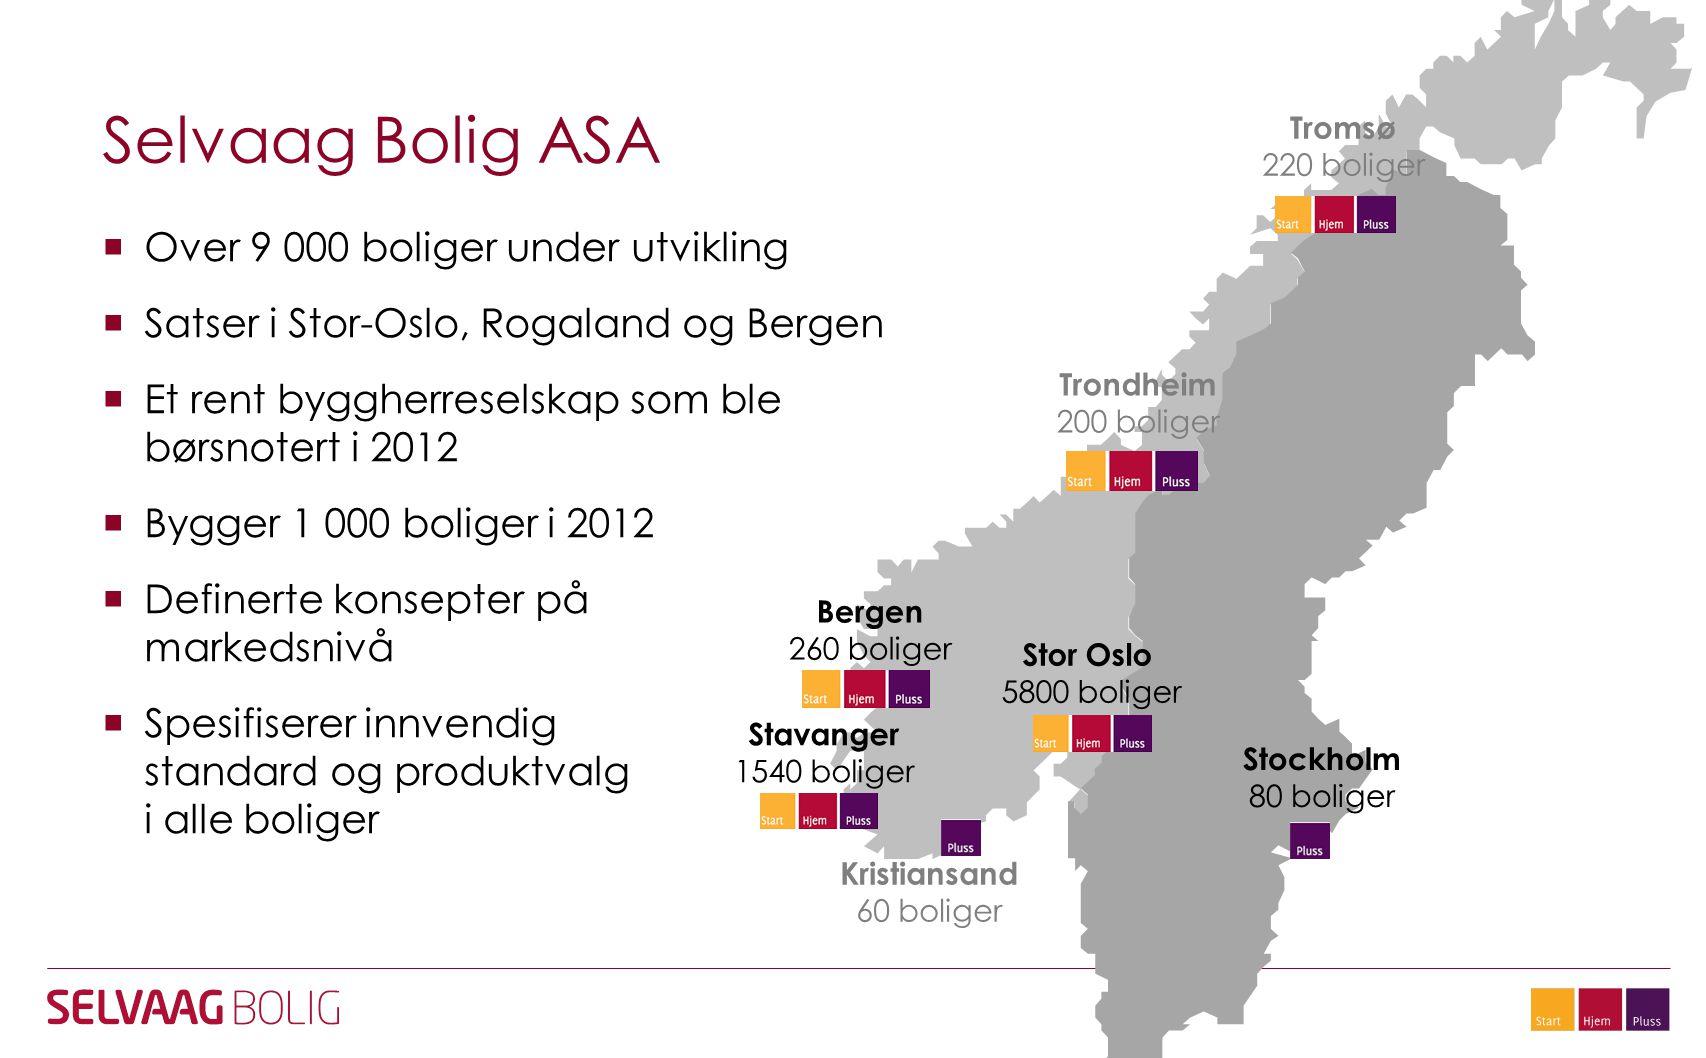 Tromsø 220 boliger Trondheim 200 boliger Stockholm 80 boliger Stor Oslo 5800 boliger Bergen 260 boliger Stavanger 1540 boliger Kristiansand 60 boliger